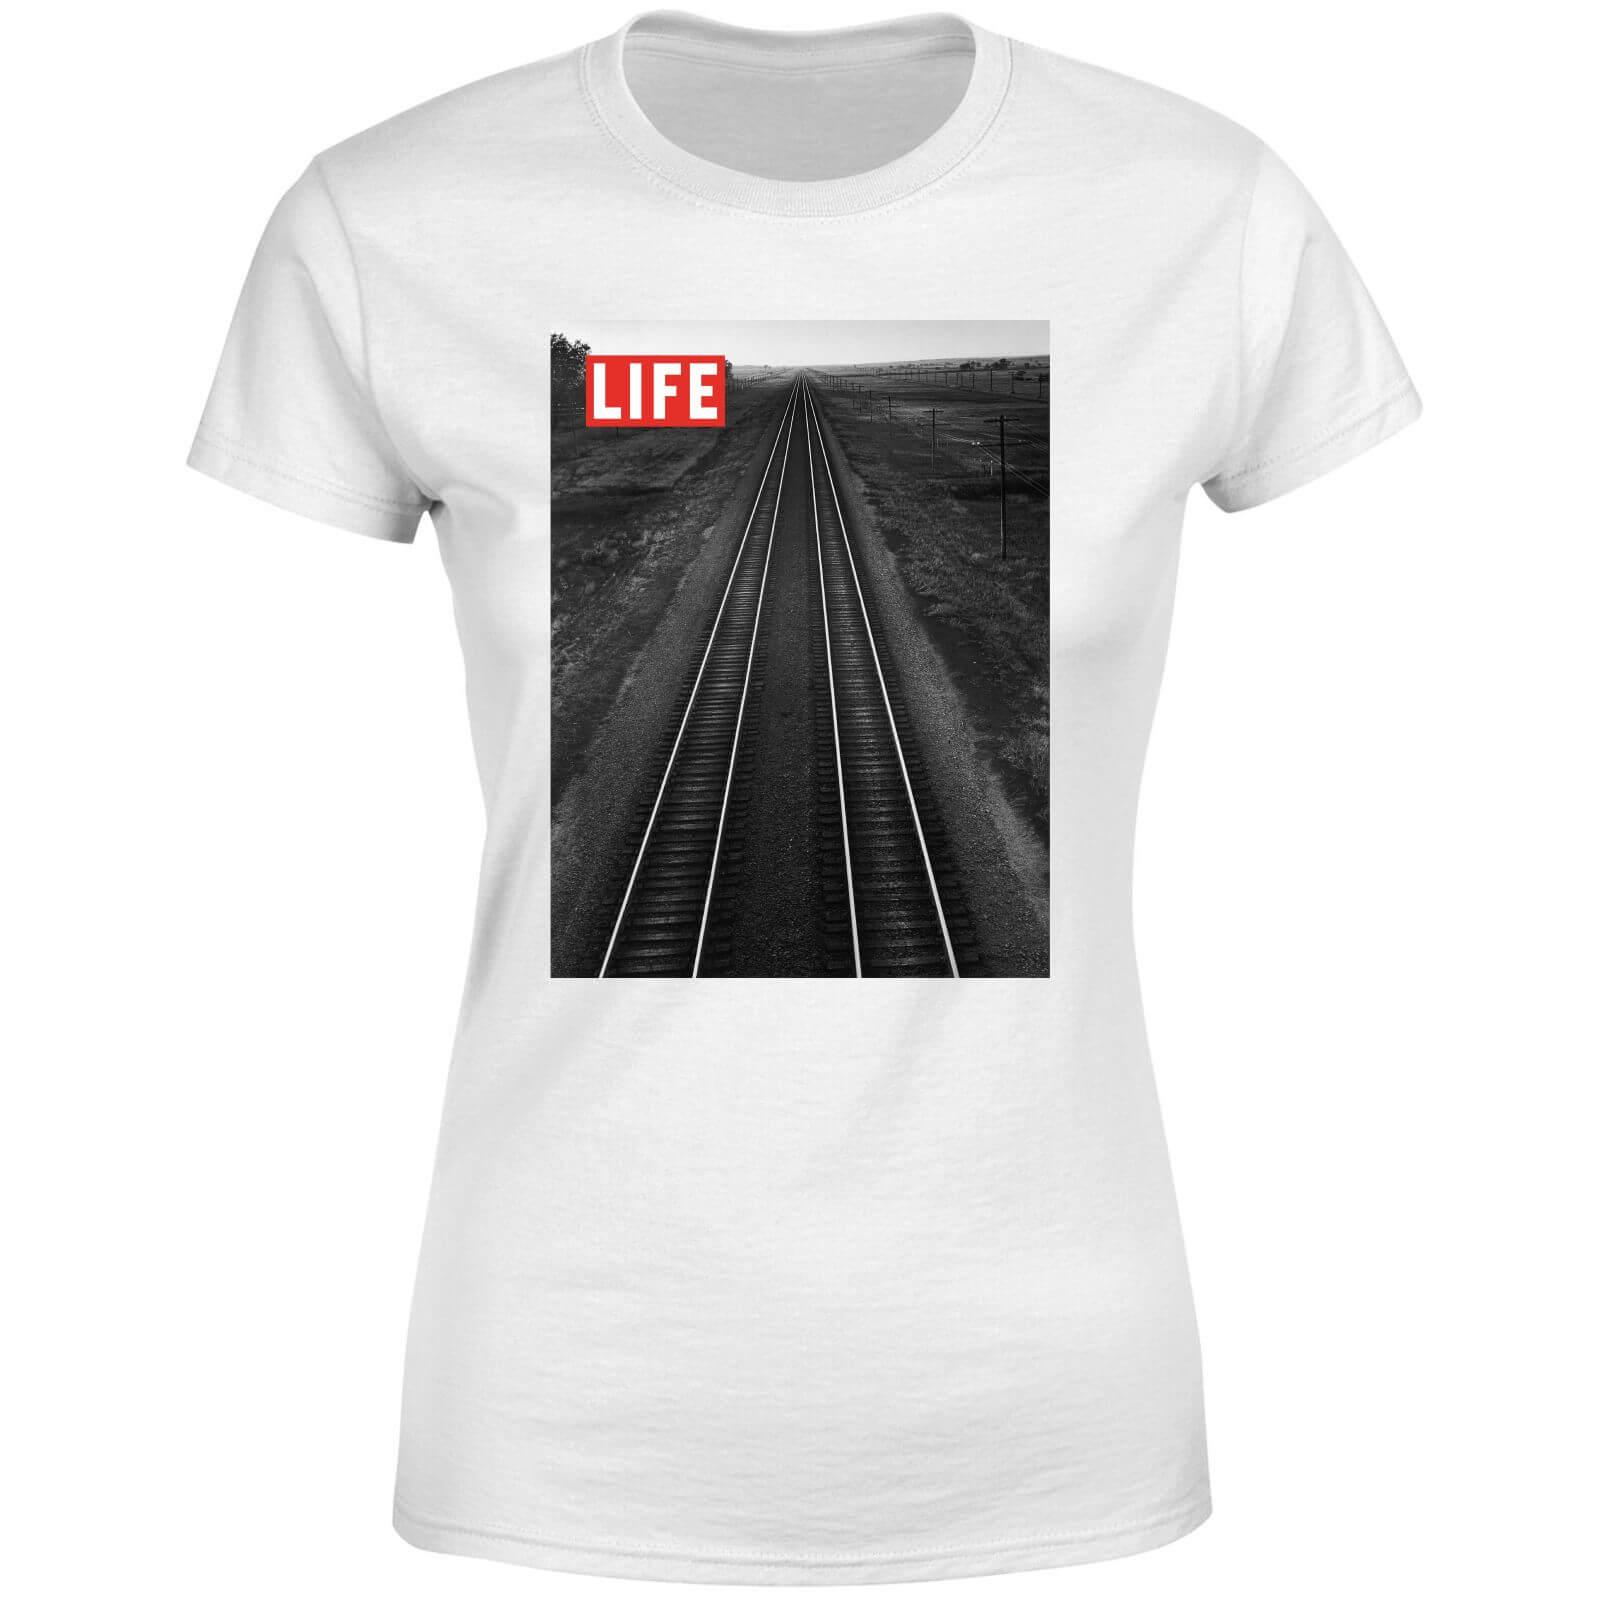 LIFE Magazine Railway Women's T-Shirt - White - S - White-female